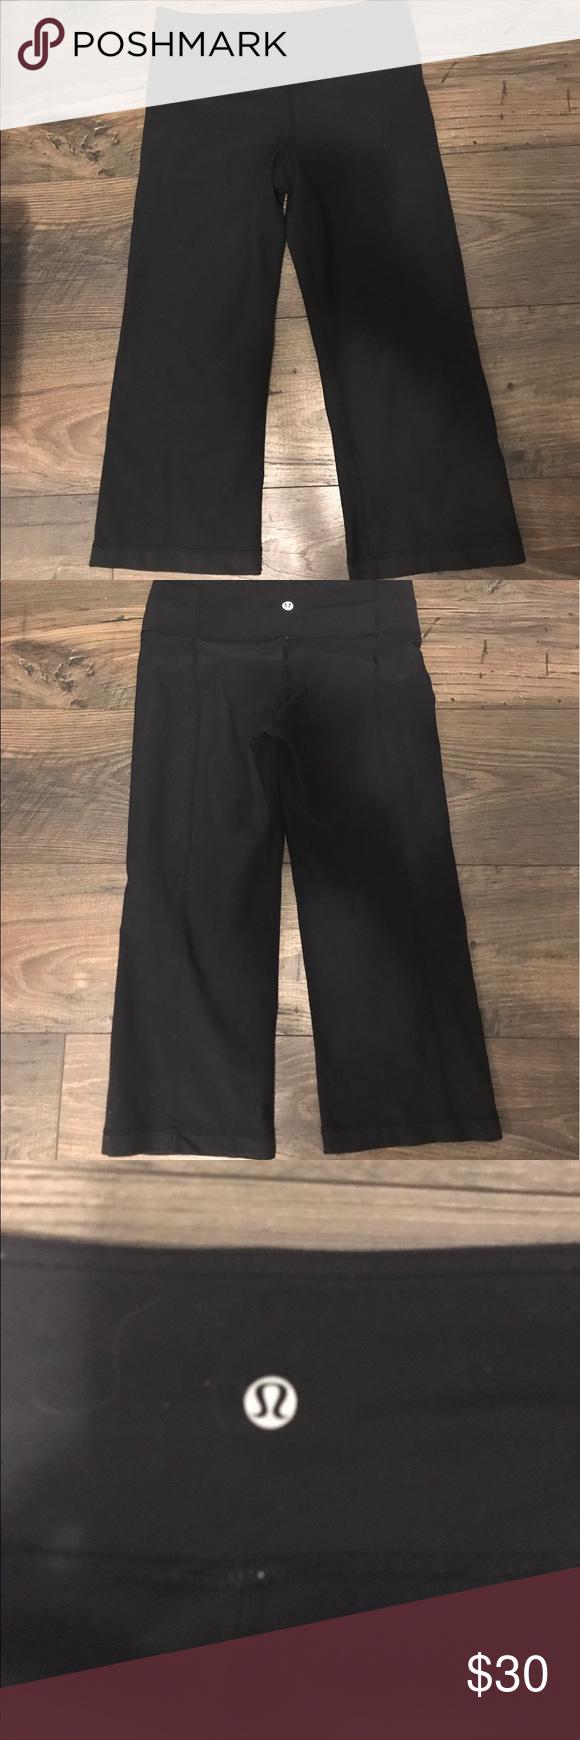 Lululemon Black Cropped Flare Capris Sz 4 Shows signs of light wear, reversible! Open to offers! lululemon athletica Pants Capris